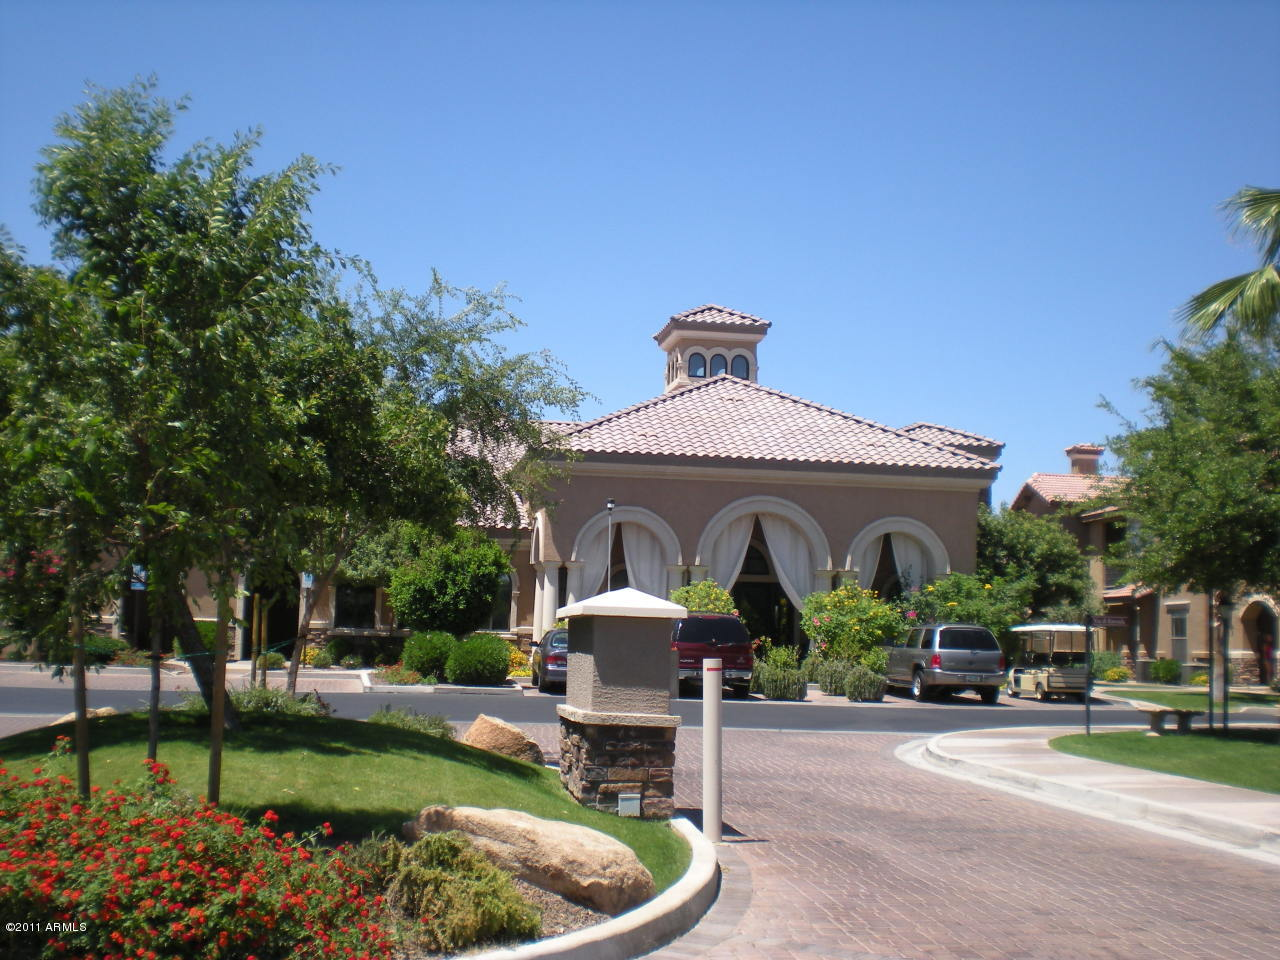 14250 W WIGWAM Boulevard # 2225, Litchfield Park, AZ 85340, 1 Bedroom Bedrooms, ,Residential Lease,For Rent,14250 W WIGWAM Boulevard # 2225,6201944